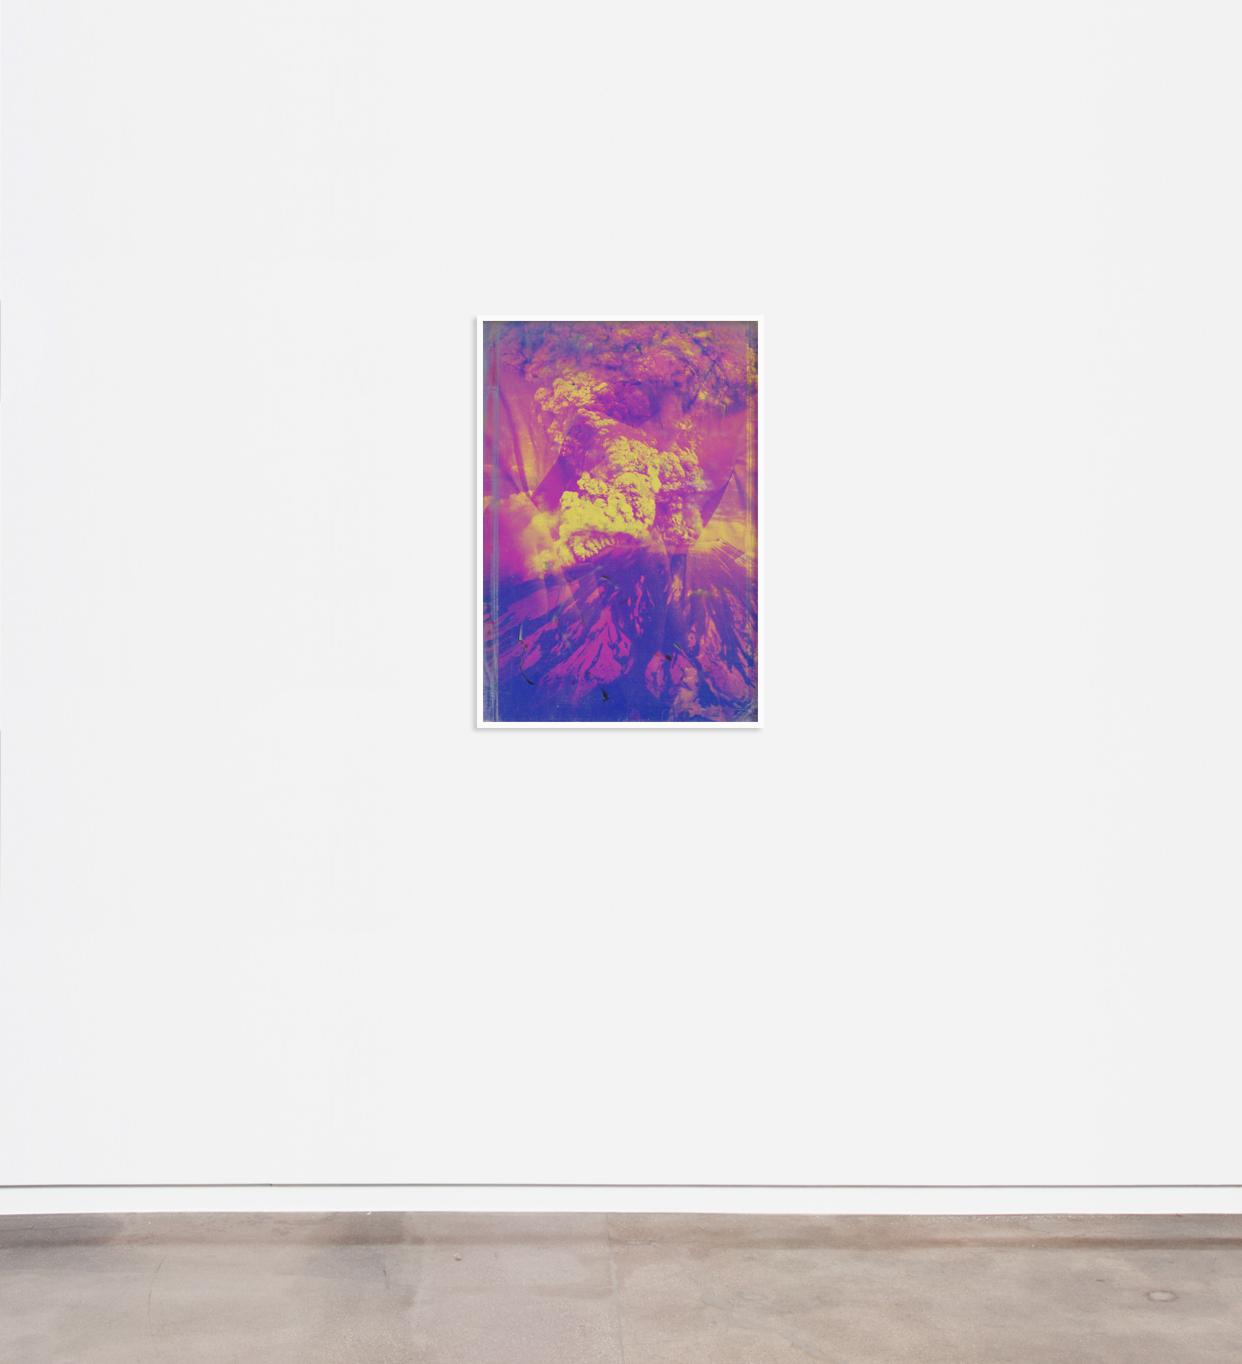 Case Simmons, Simmons & Burke, If Not Winter Composite #6, Kohn Gallery, Composite Image, Lightjet Print, Digital Collage,Digital Art, Photoshop Collage, Contemporary Collage,Case Simmons Art, Case Simmons Artist, Collage Fine Art, Hyper Collage, Digital Painting,Digital Landscape